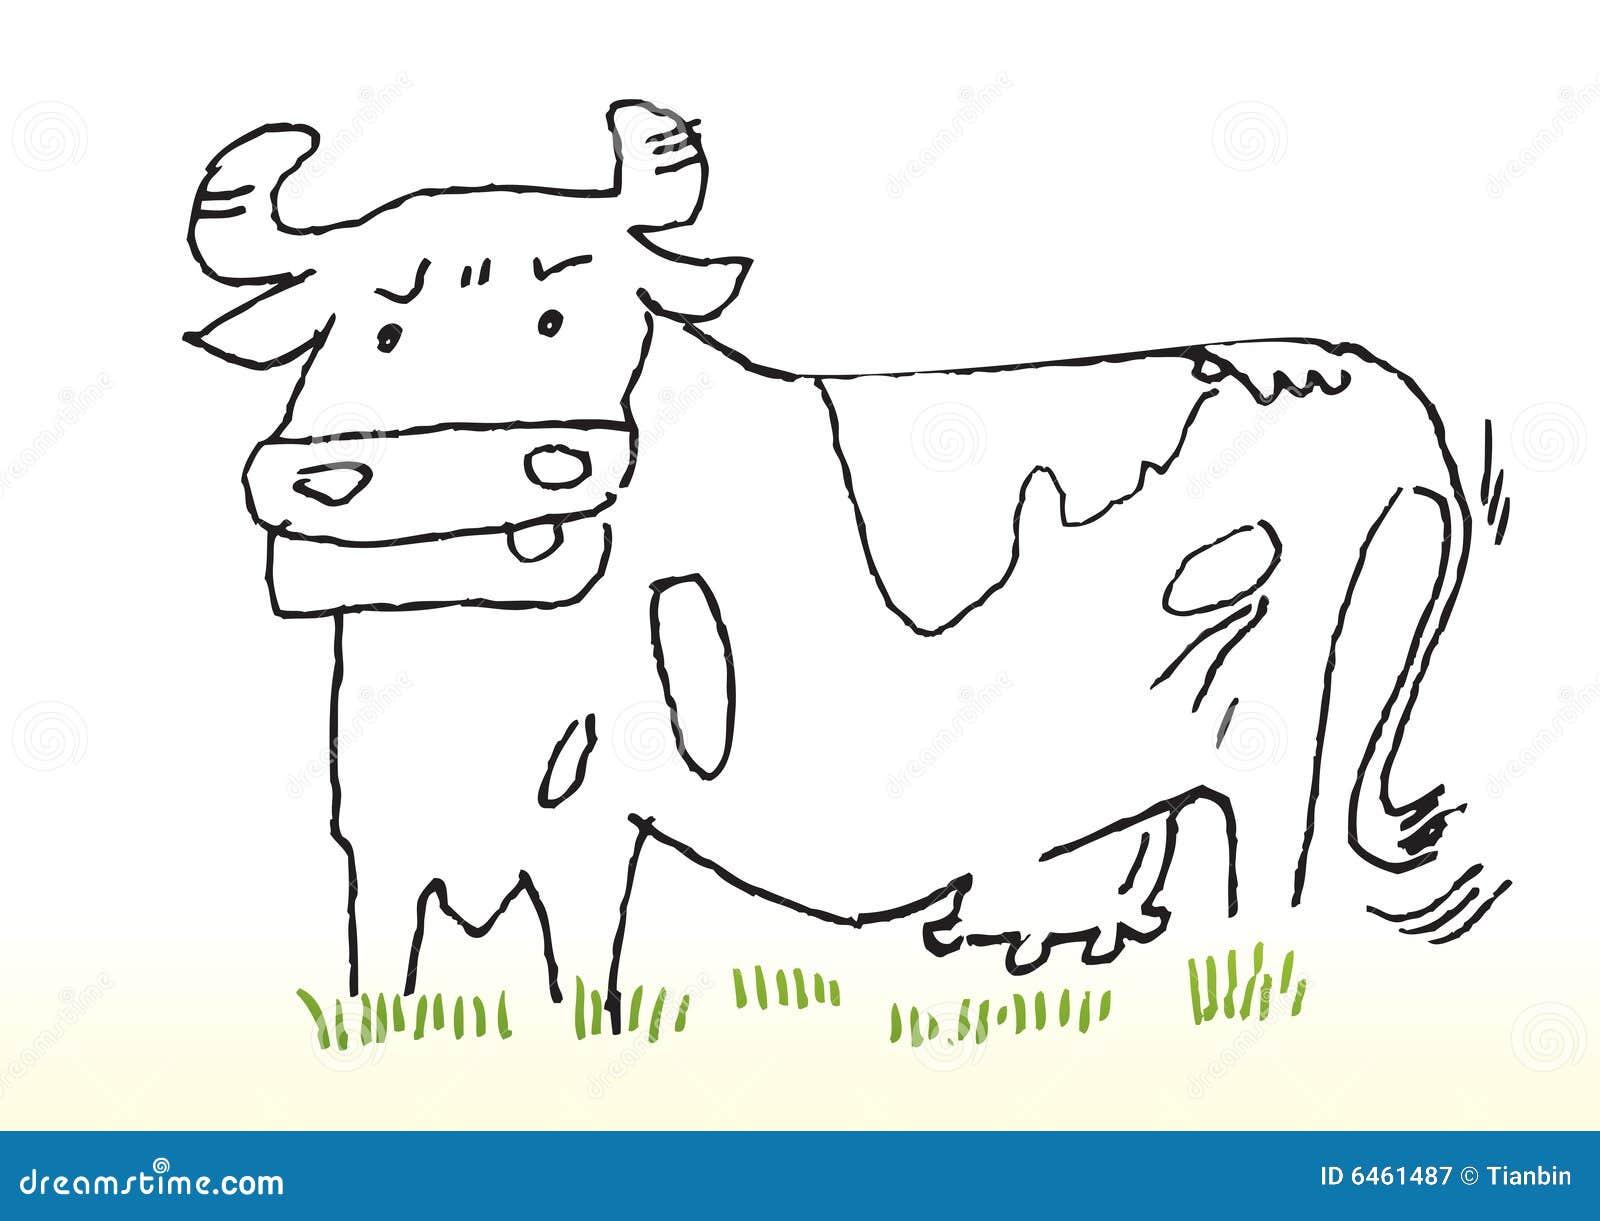 Karikatur-Skizze der Kuh